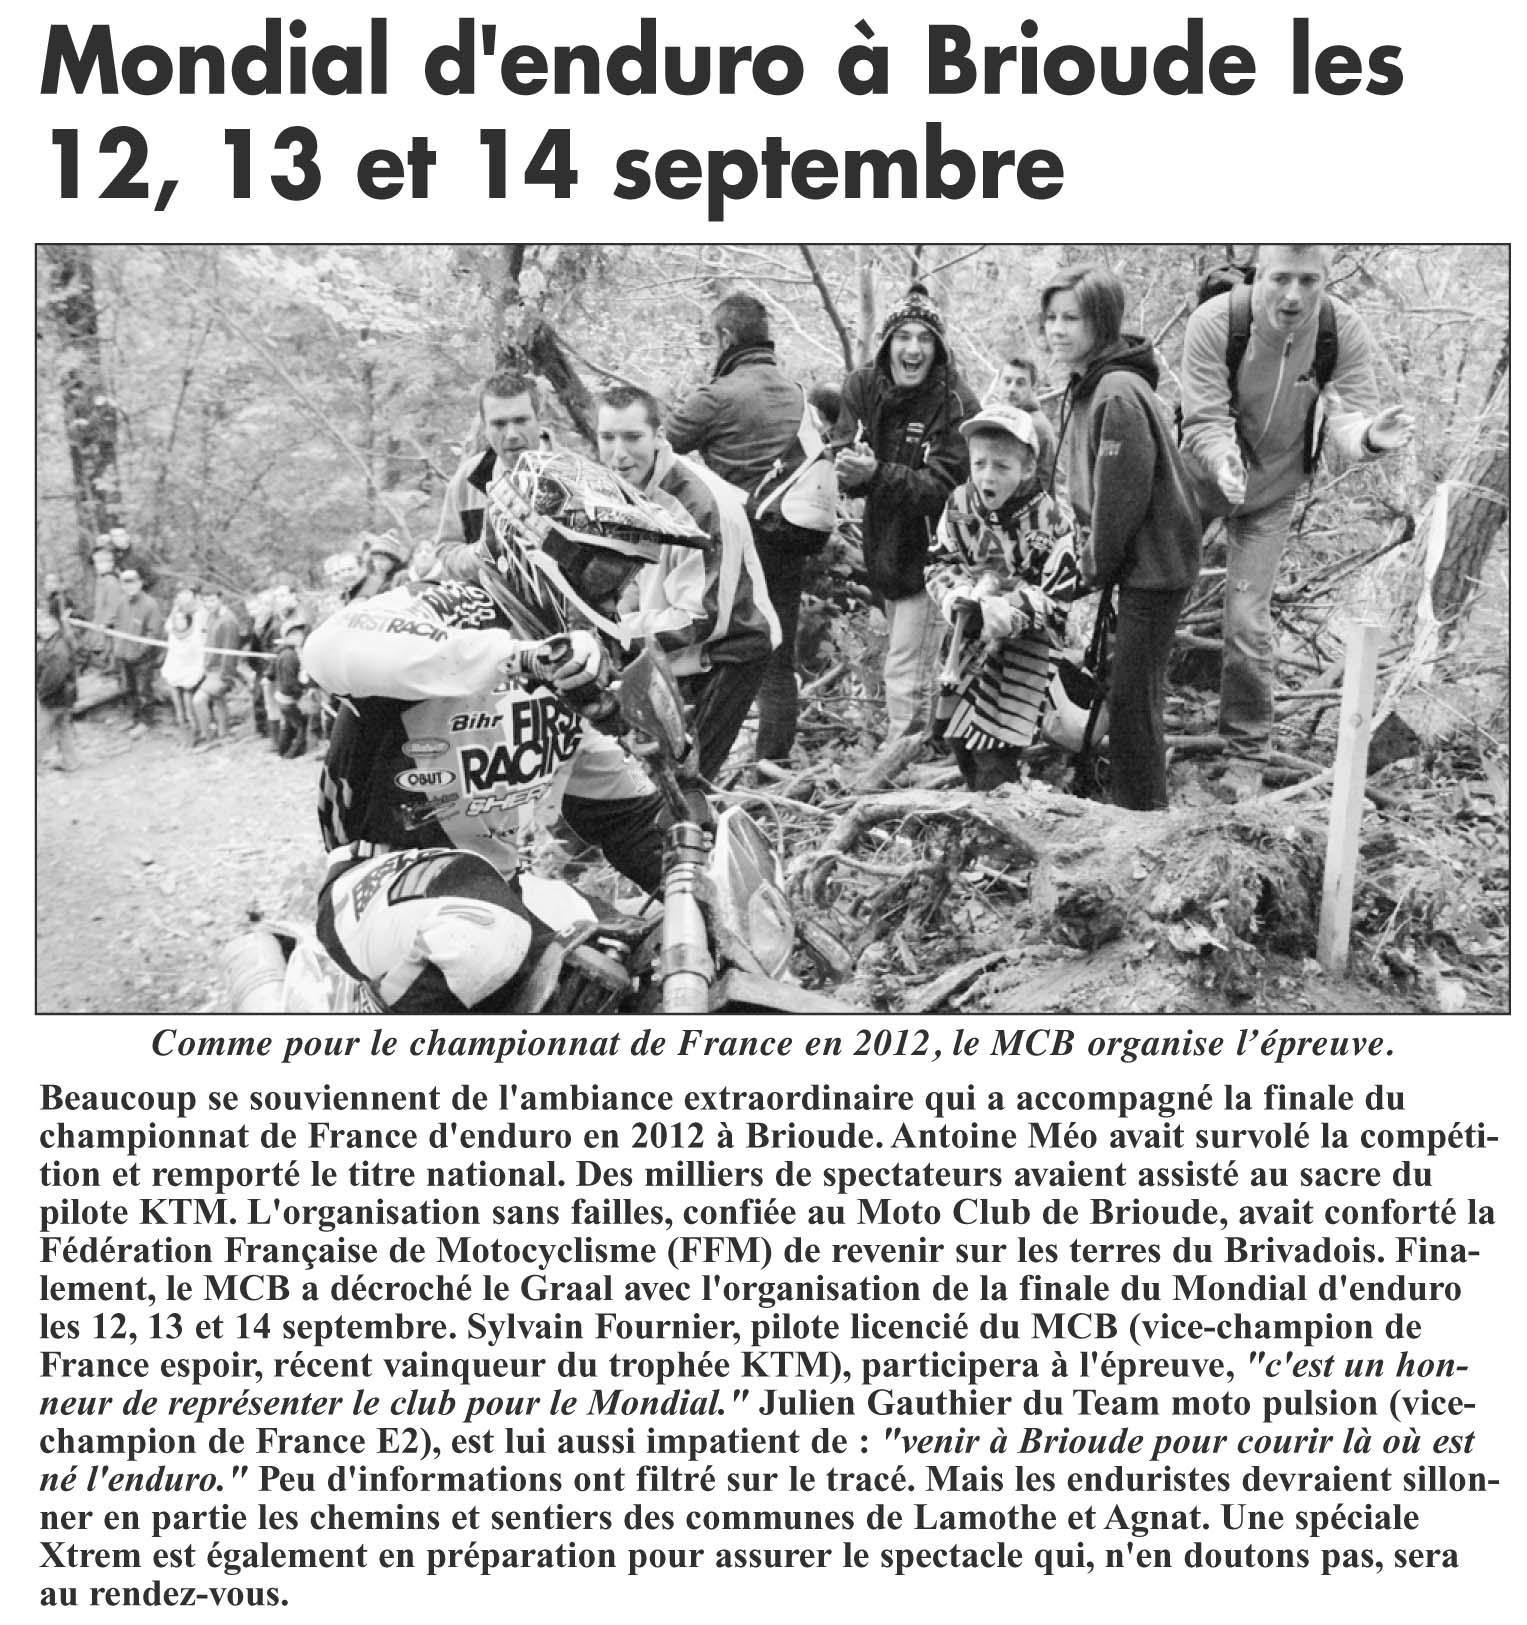 La Ruche 17/01/2014